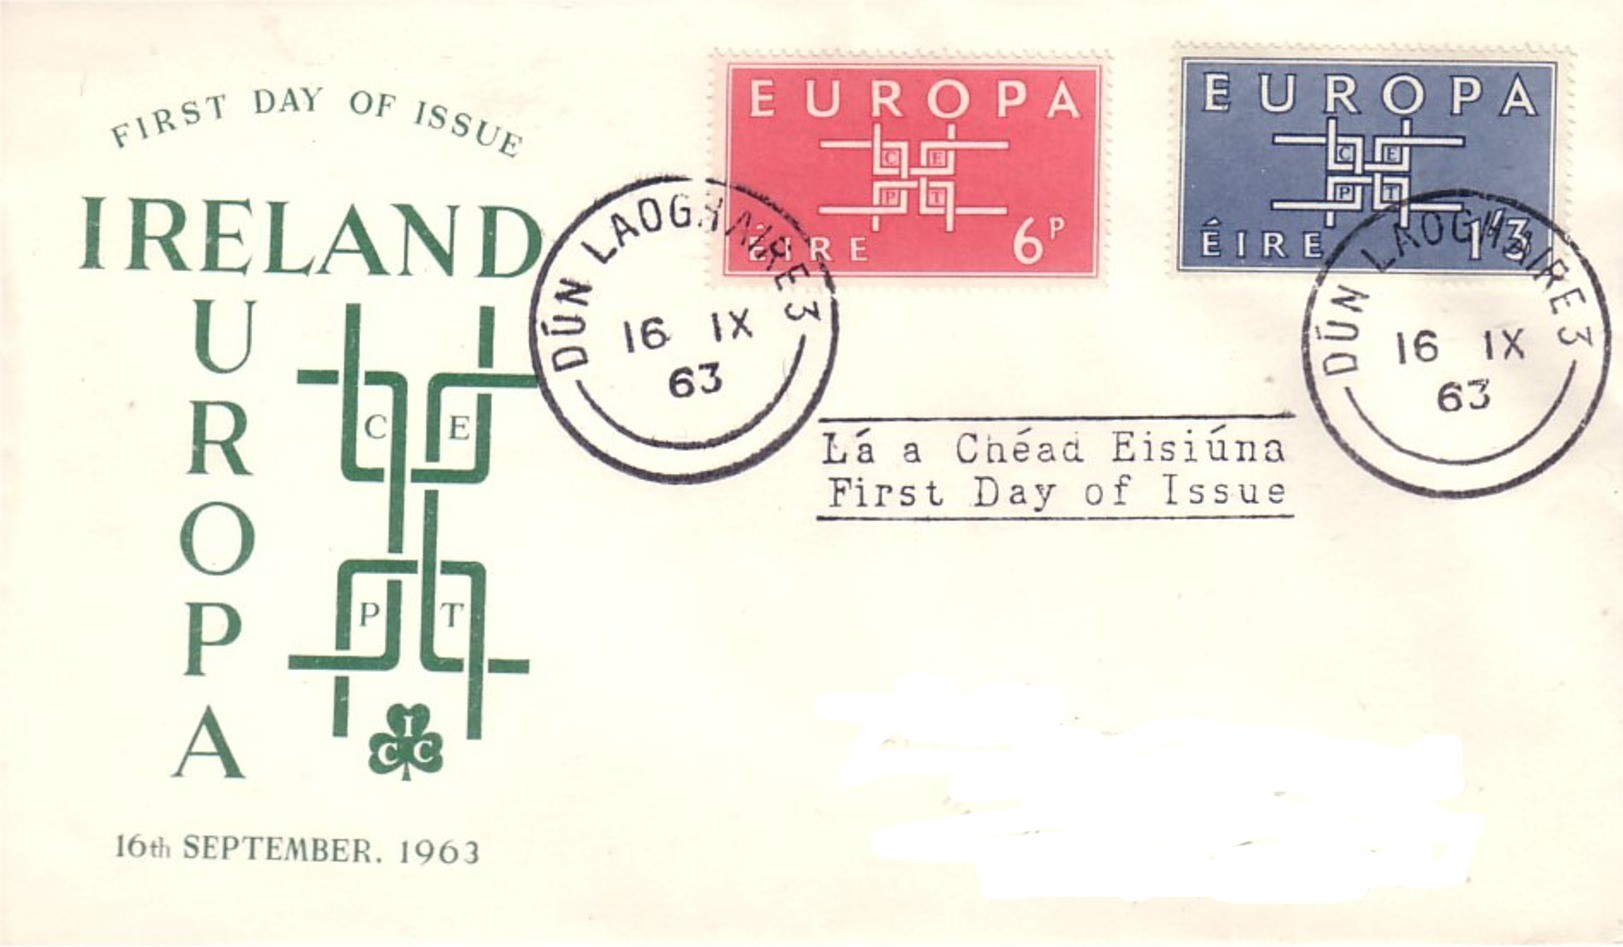 Ireland 1963 Europa FDCd.jpg